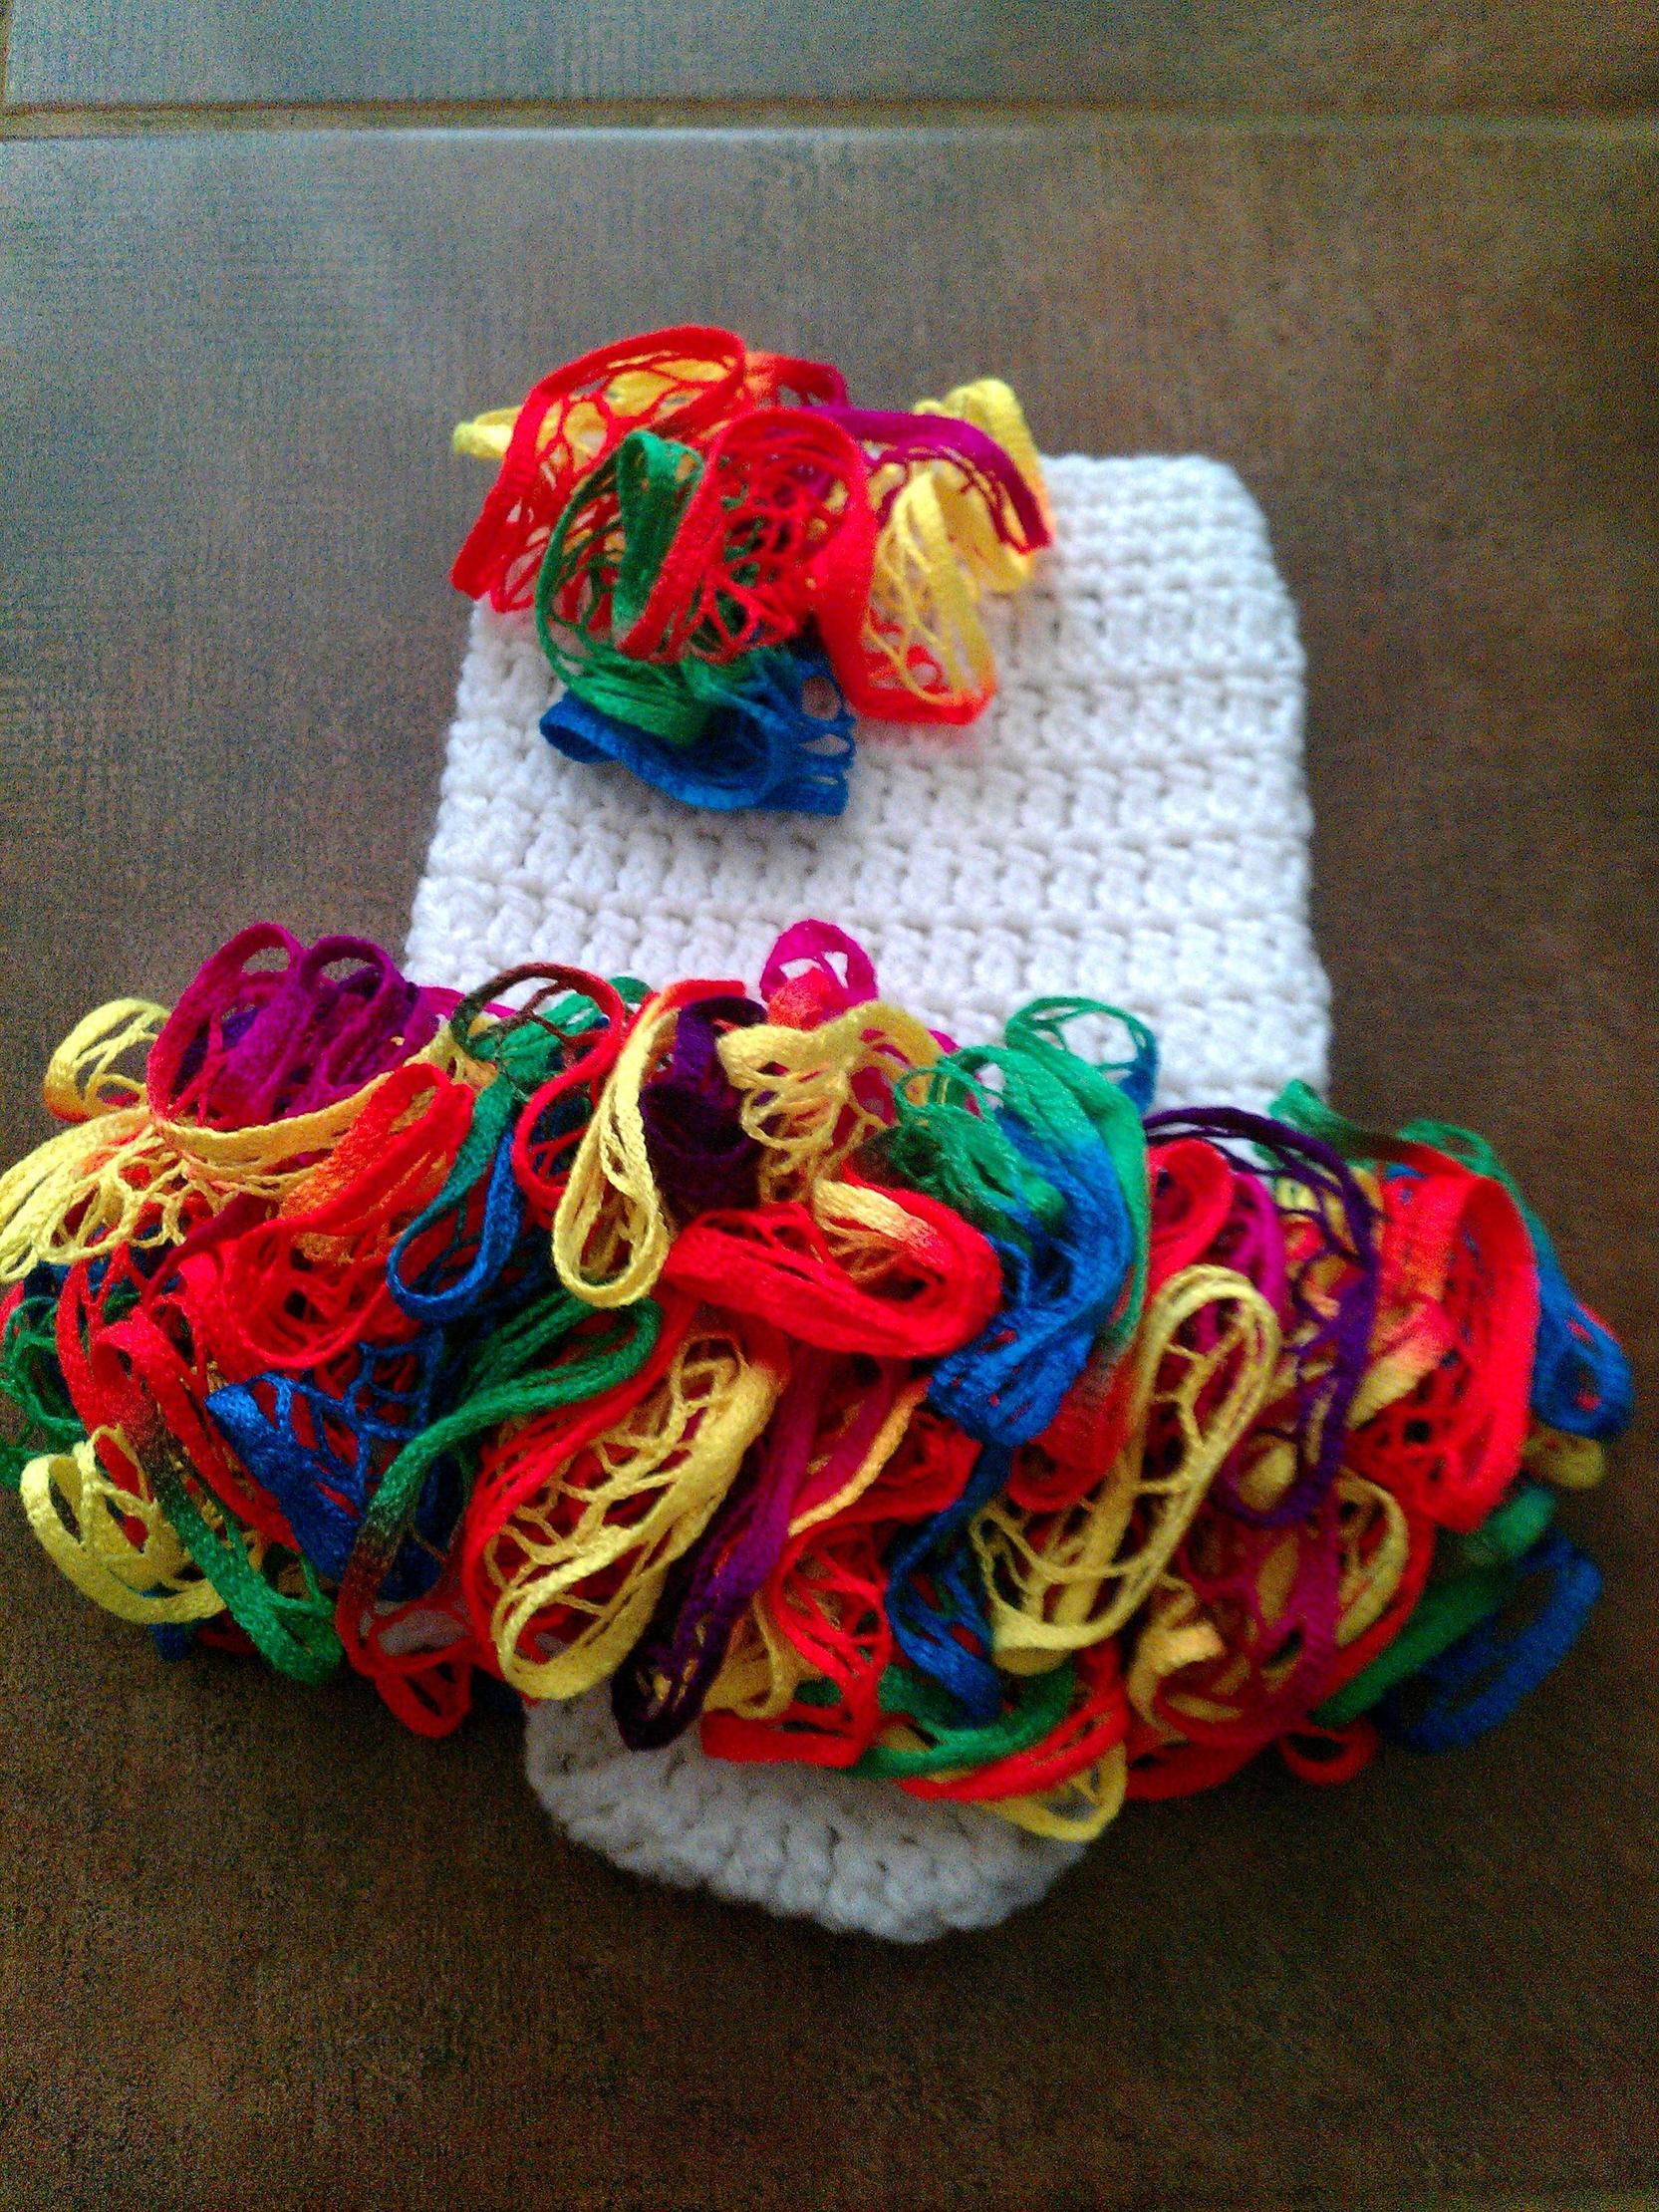 Knitting Yarn Scarf : Knit sashay scarf patterns the funky stitch